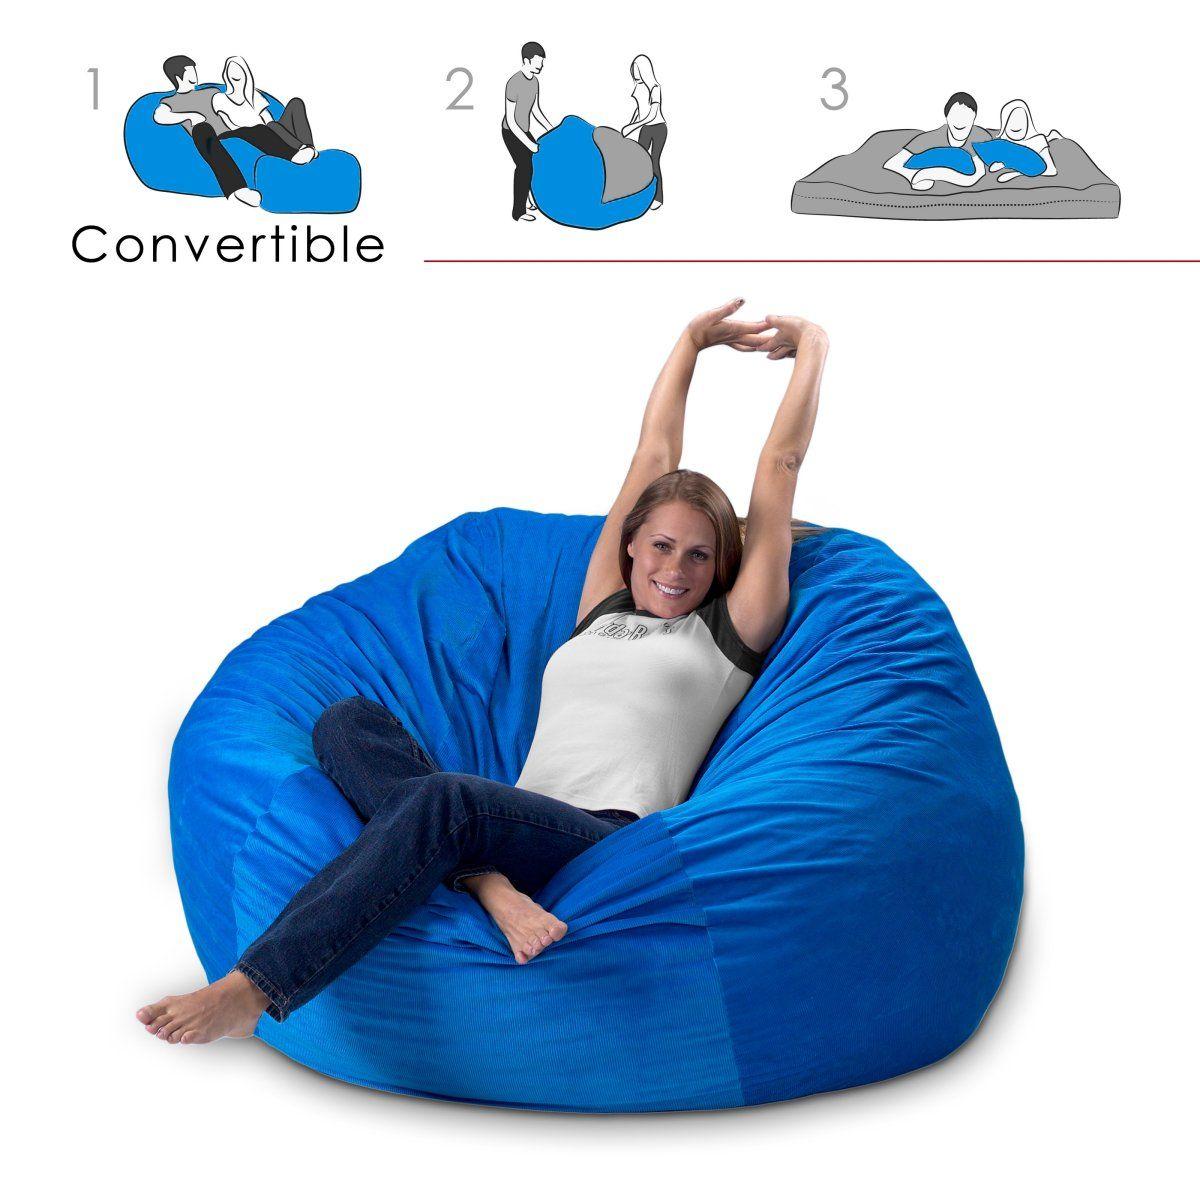 Miraculous Corda Roys Queen Size Convertible Foam Bean Bag Bed In Andrewgaddart Wooden Chair Designs For Living Room Andrewgaddartcom